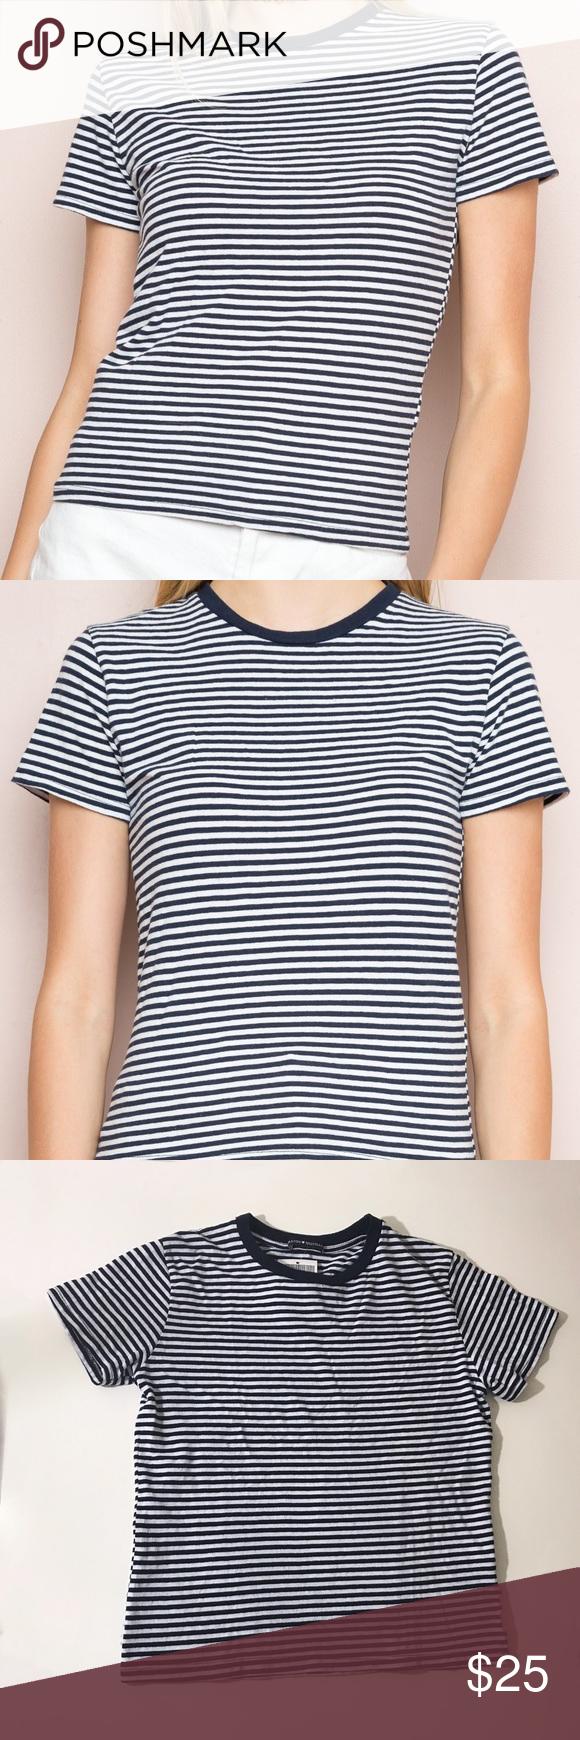 90c7c491b75 Brandy Melville striped tee 🎬 Brandy Melville Jamie top, size : os, soft  cotton